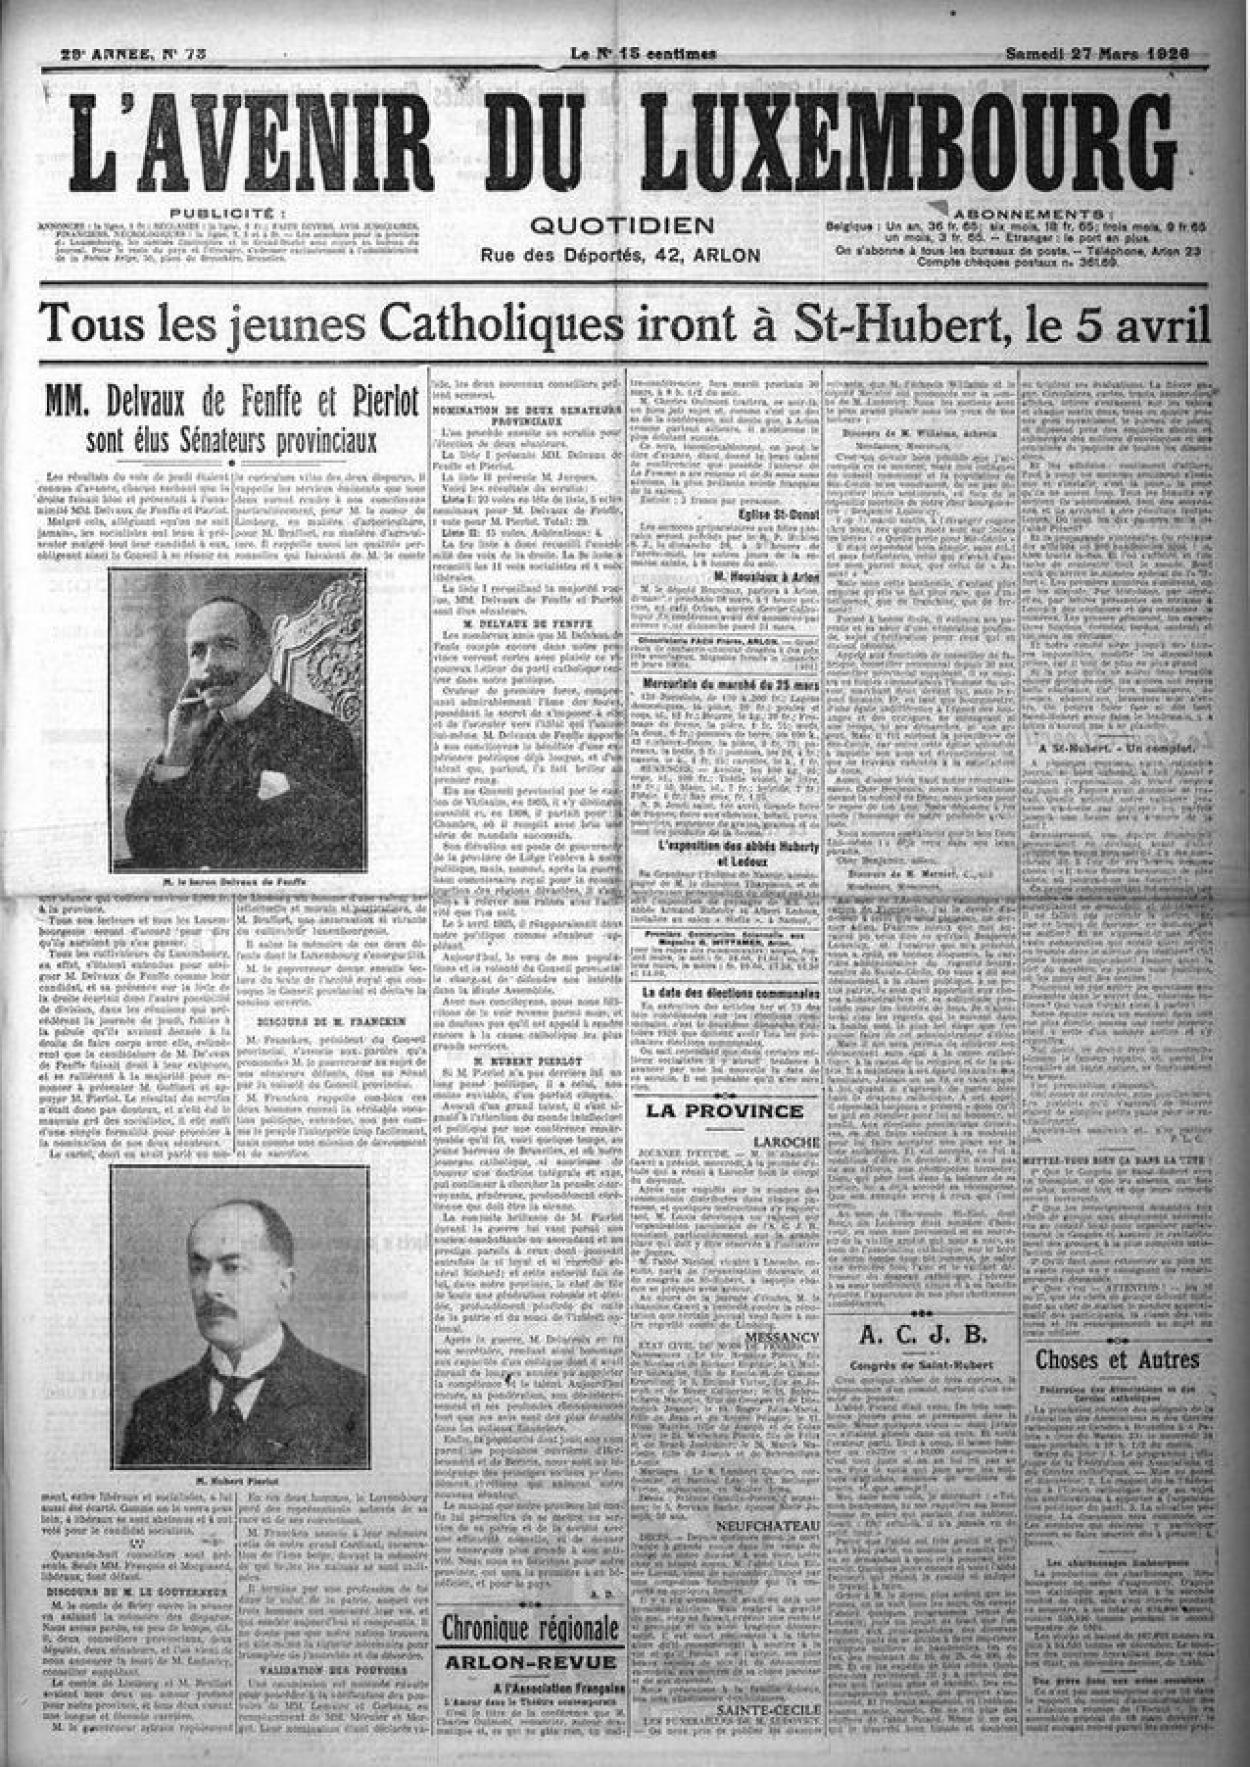 avenir-du-luxembourg-27-3-1926.jpg